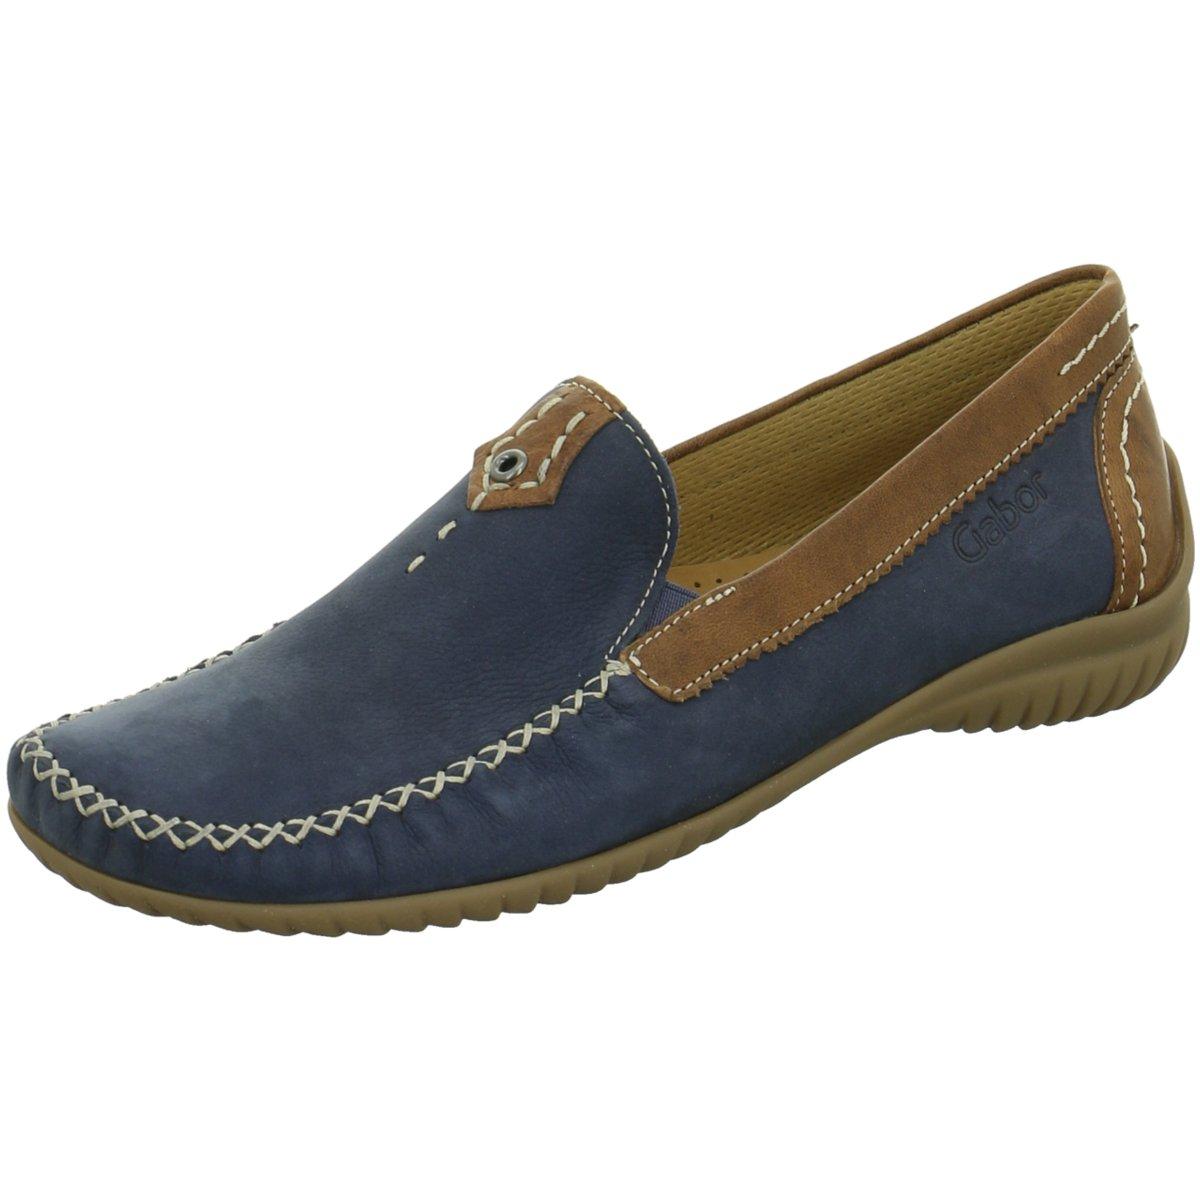 Gabor comfort Damen Slipper NV 86.090.46 blau 272029